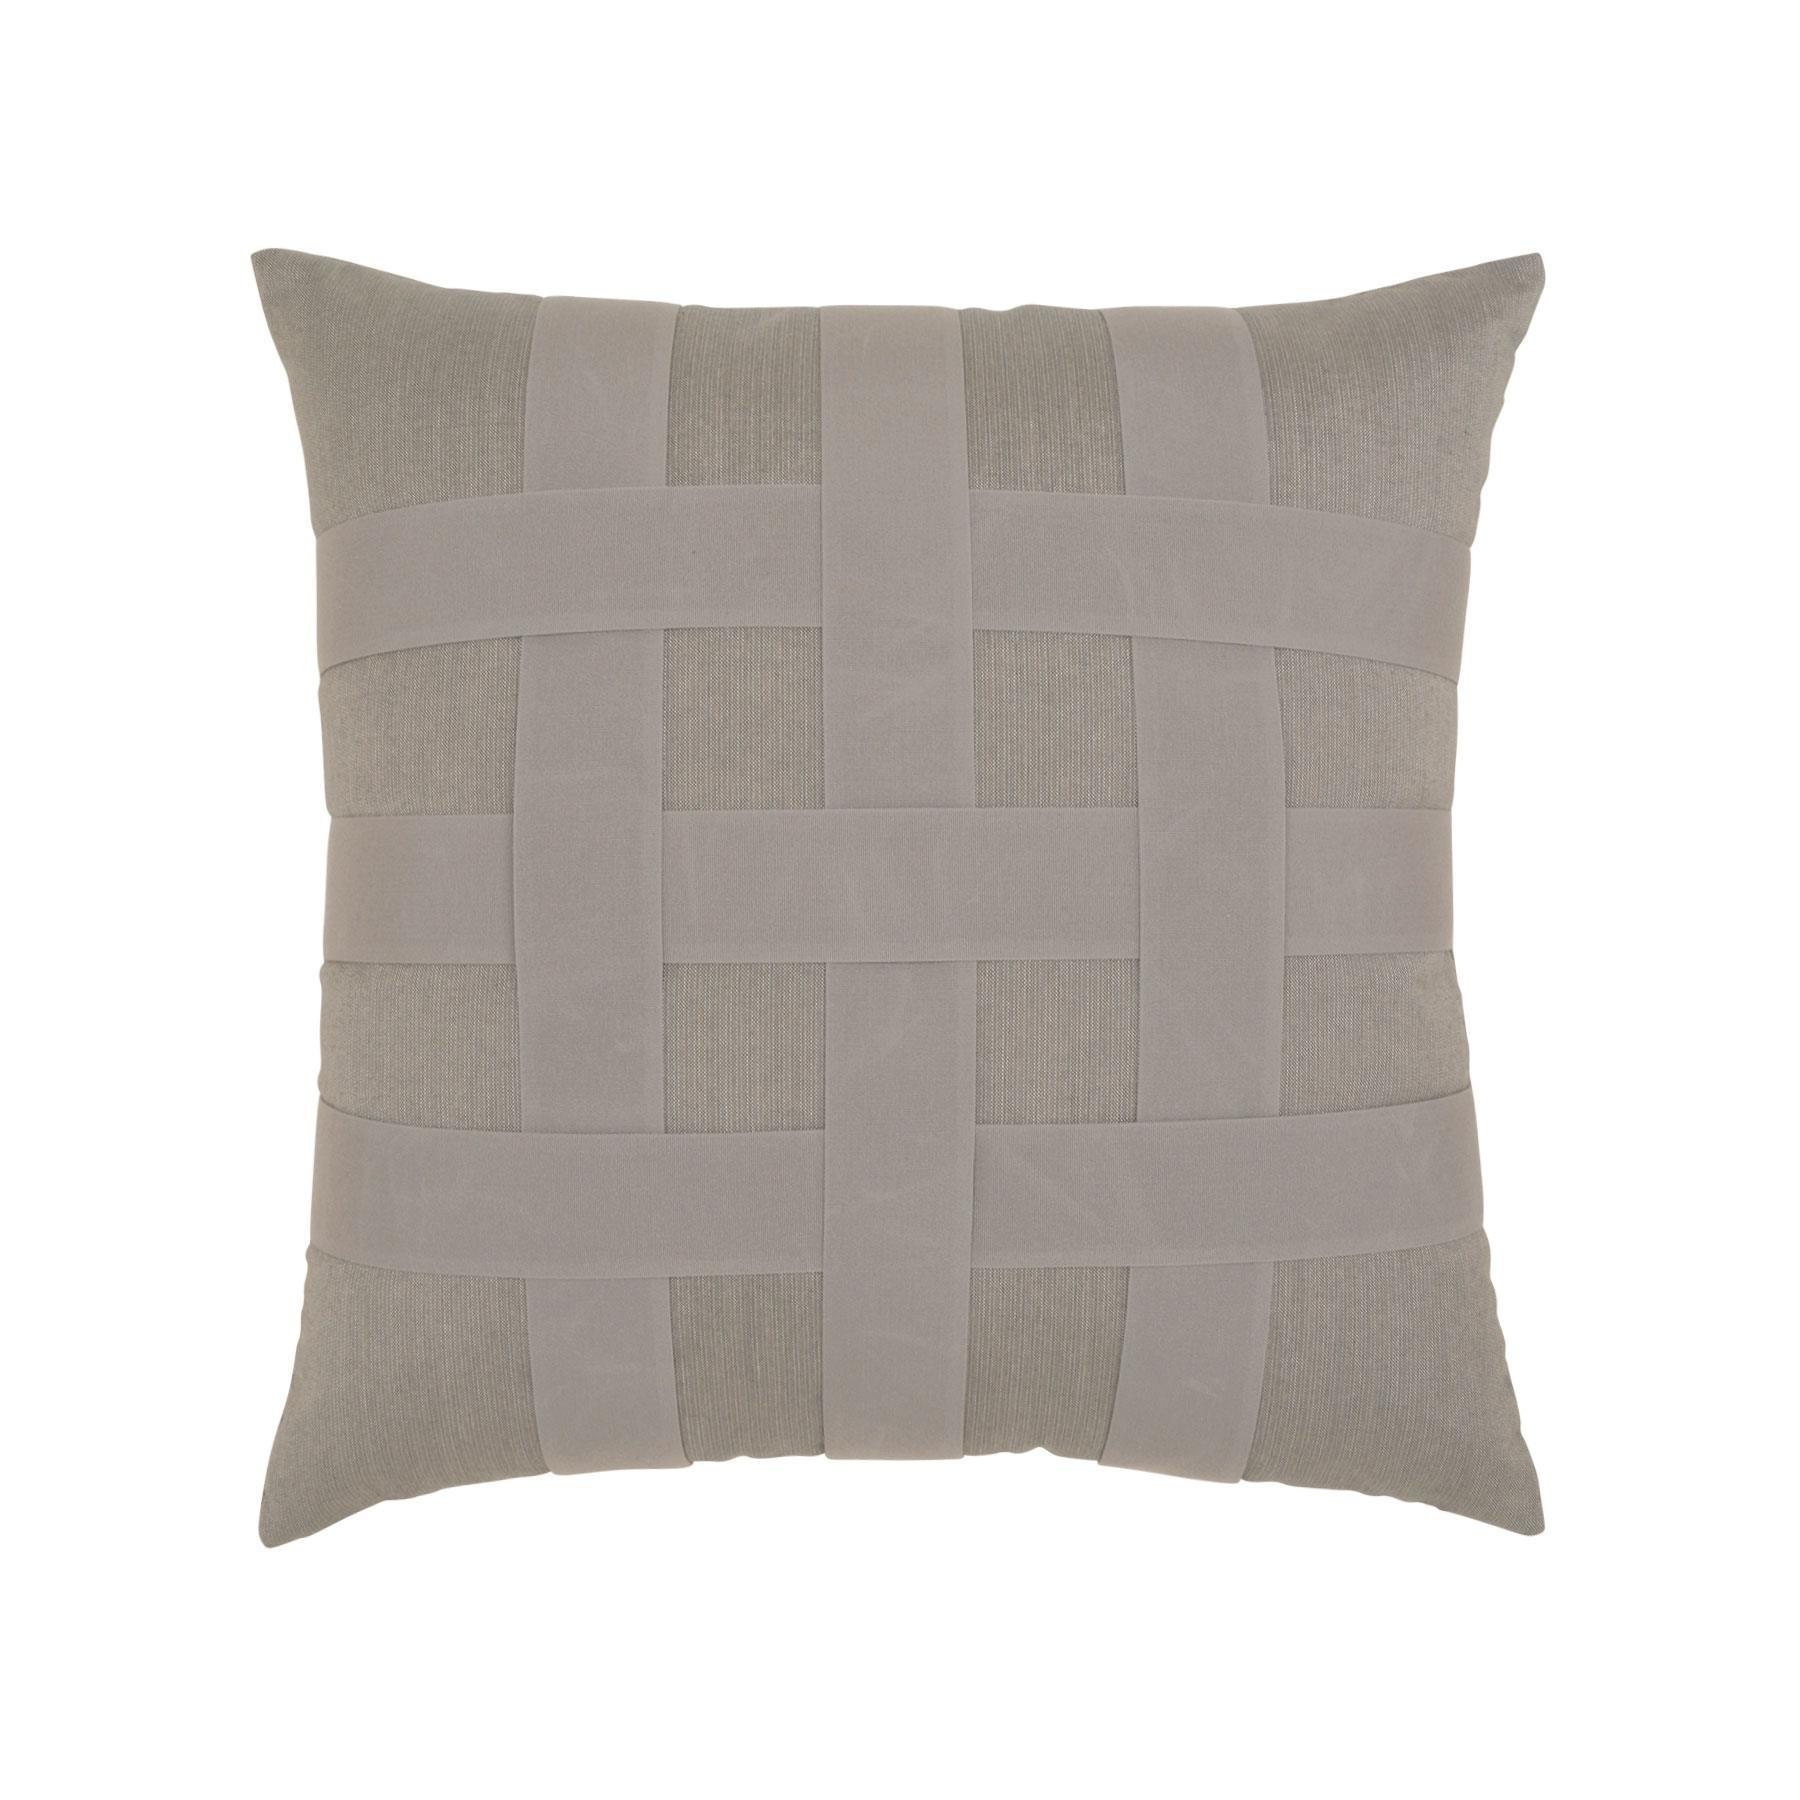 Elaine Smith Gray Basketweave Throw Pillow Leisure Living